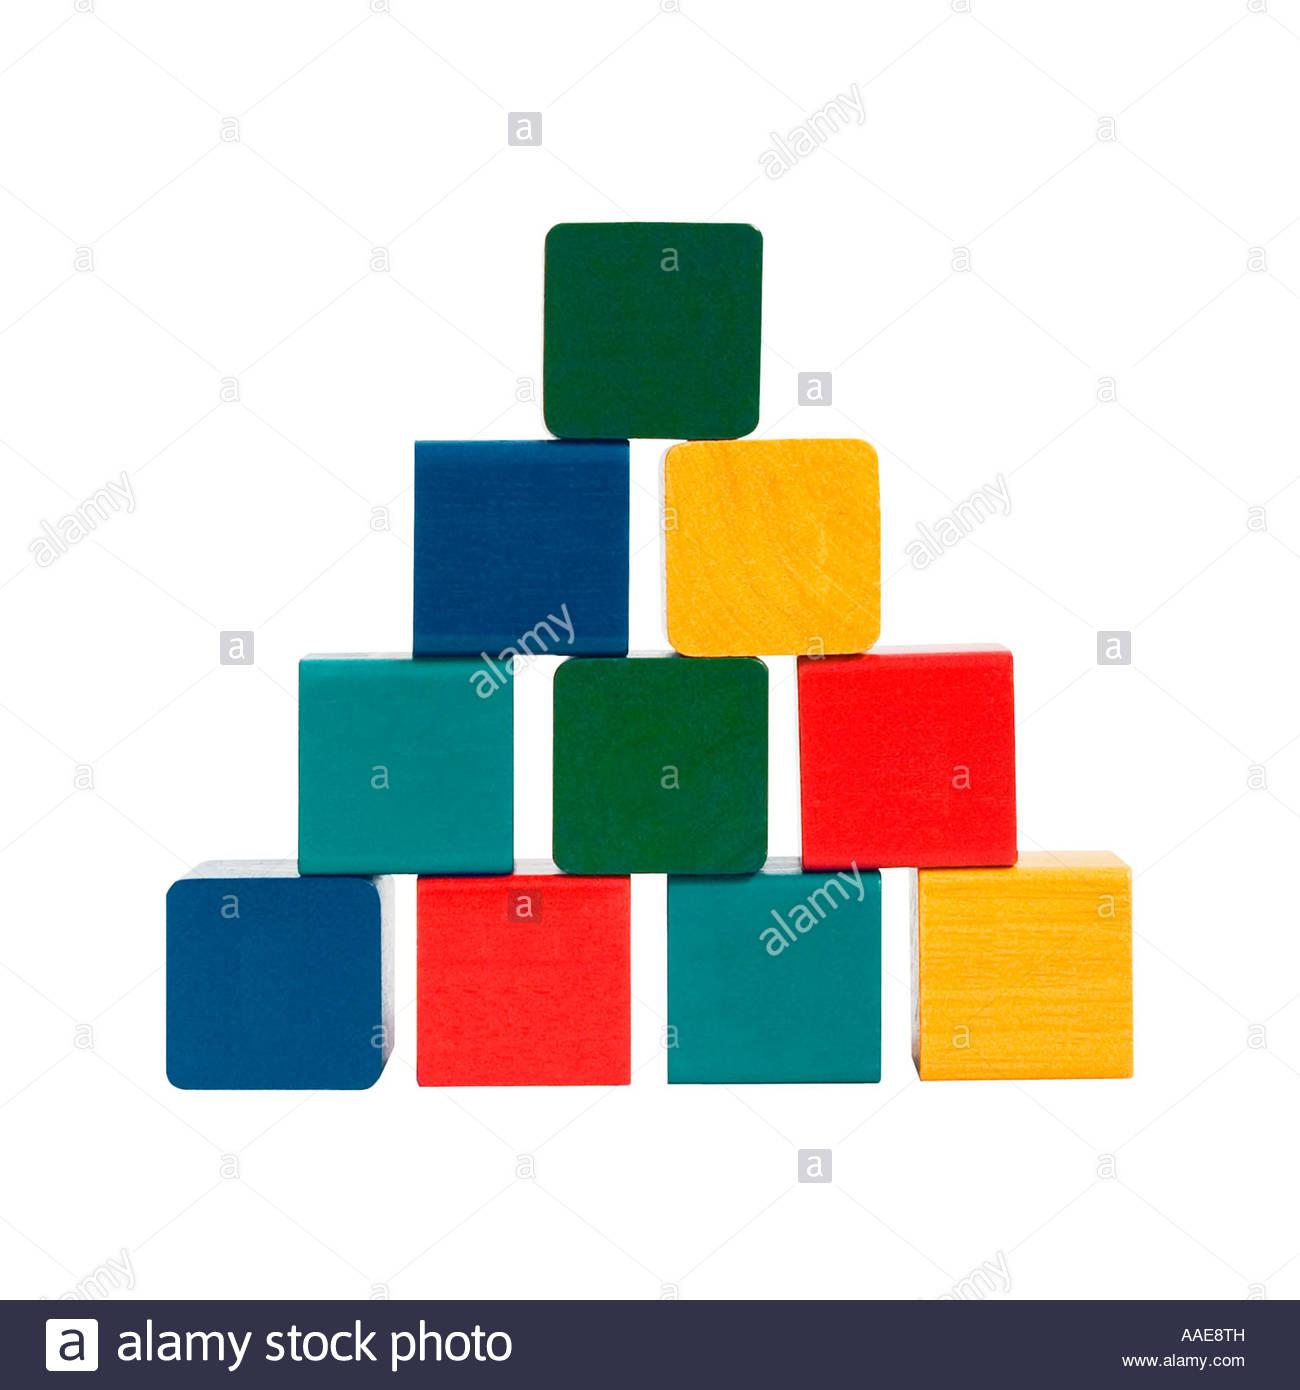 1300x1390 Coloured Building Blocks Stock Photo, Royalty Free Image 12603424